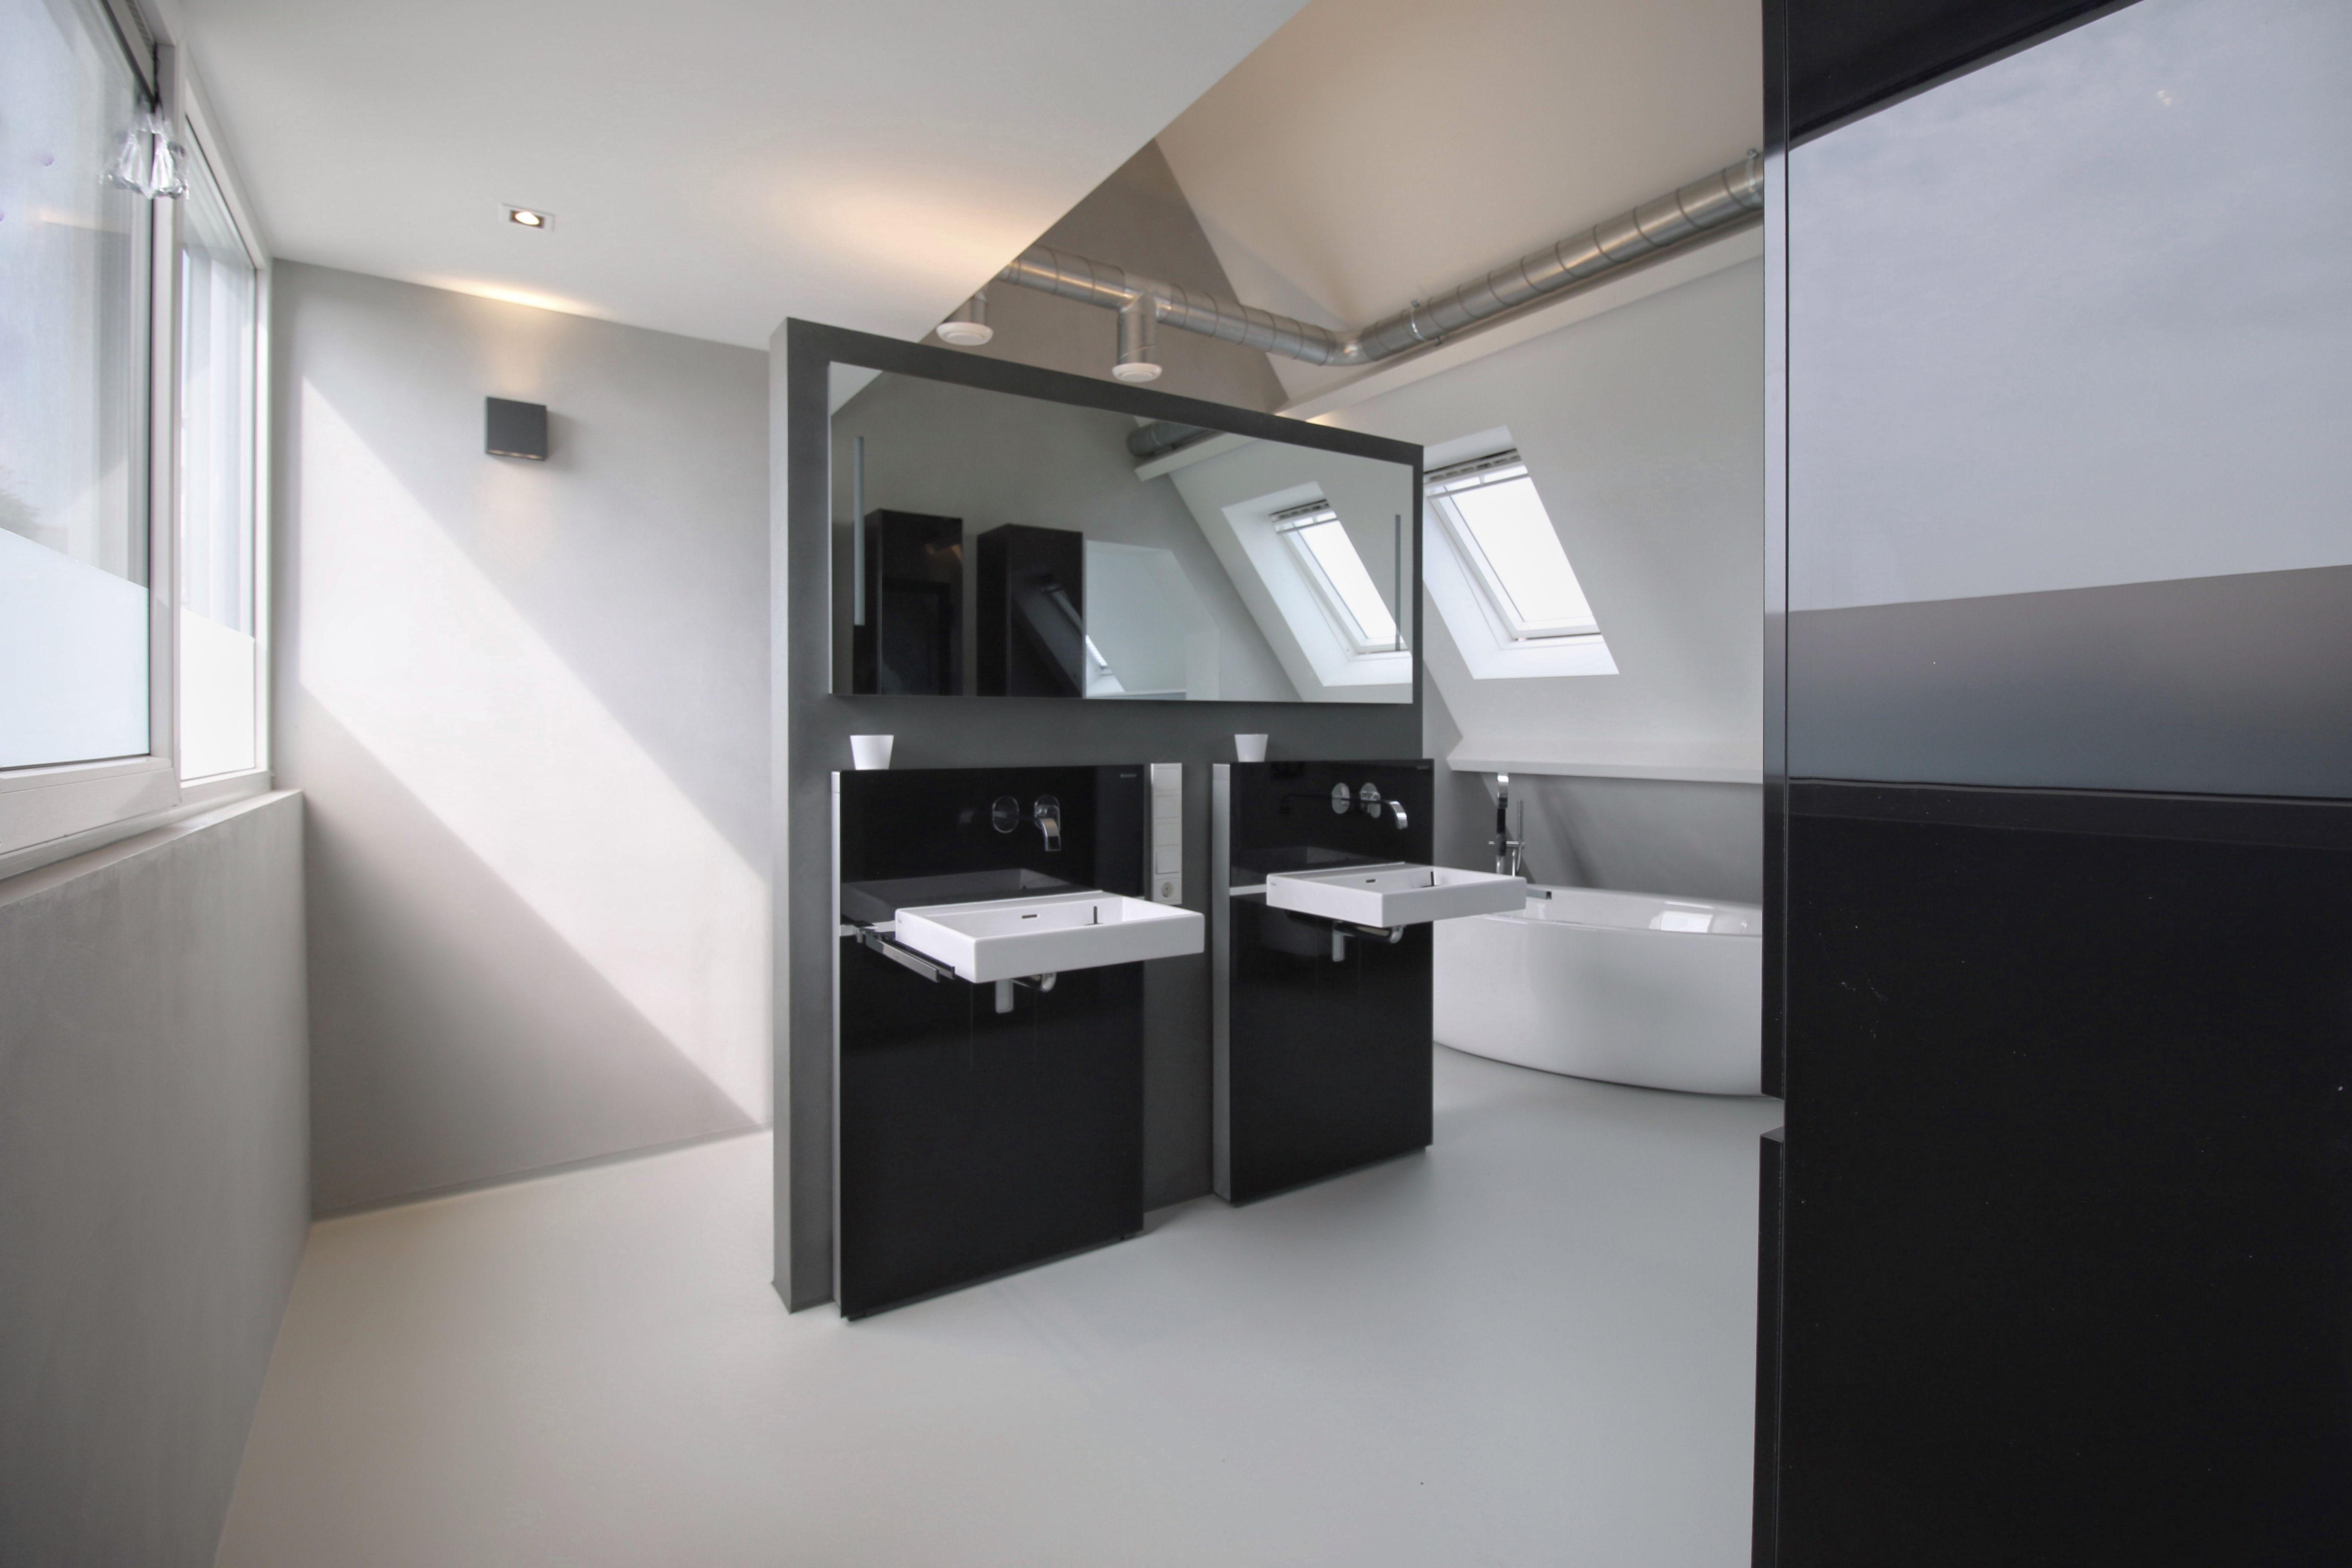 Kosten Badkamer Baderie : Badkamer in sneek ontworpen door use architects. senso gietvloer